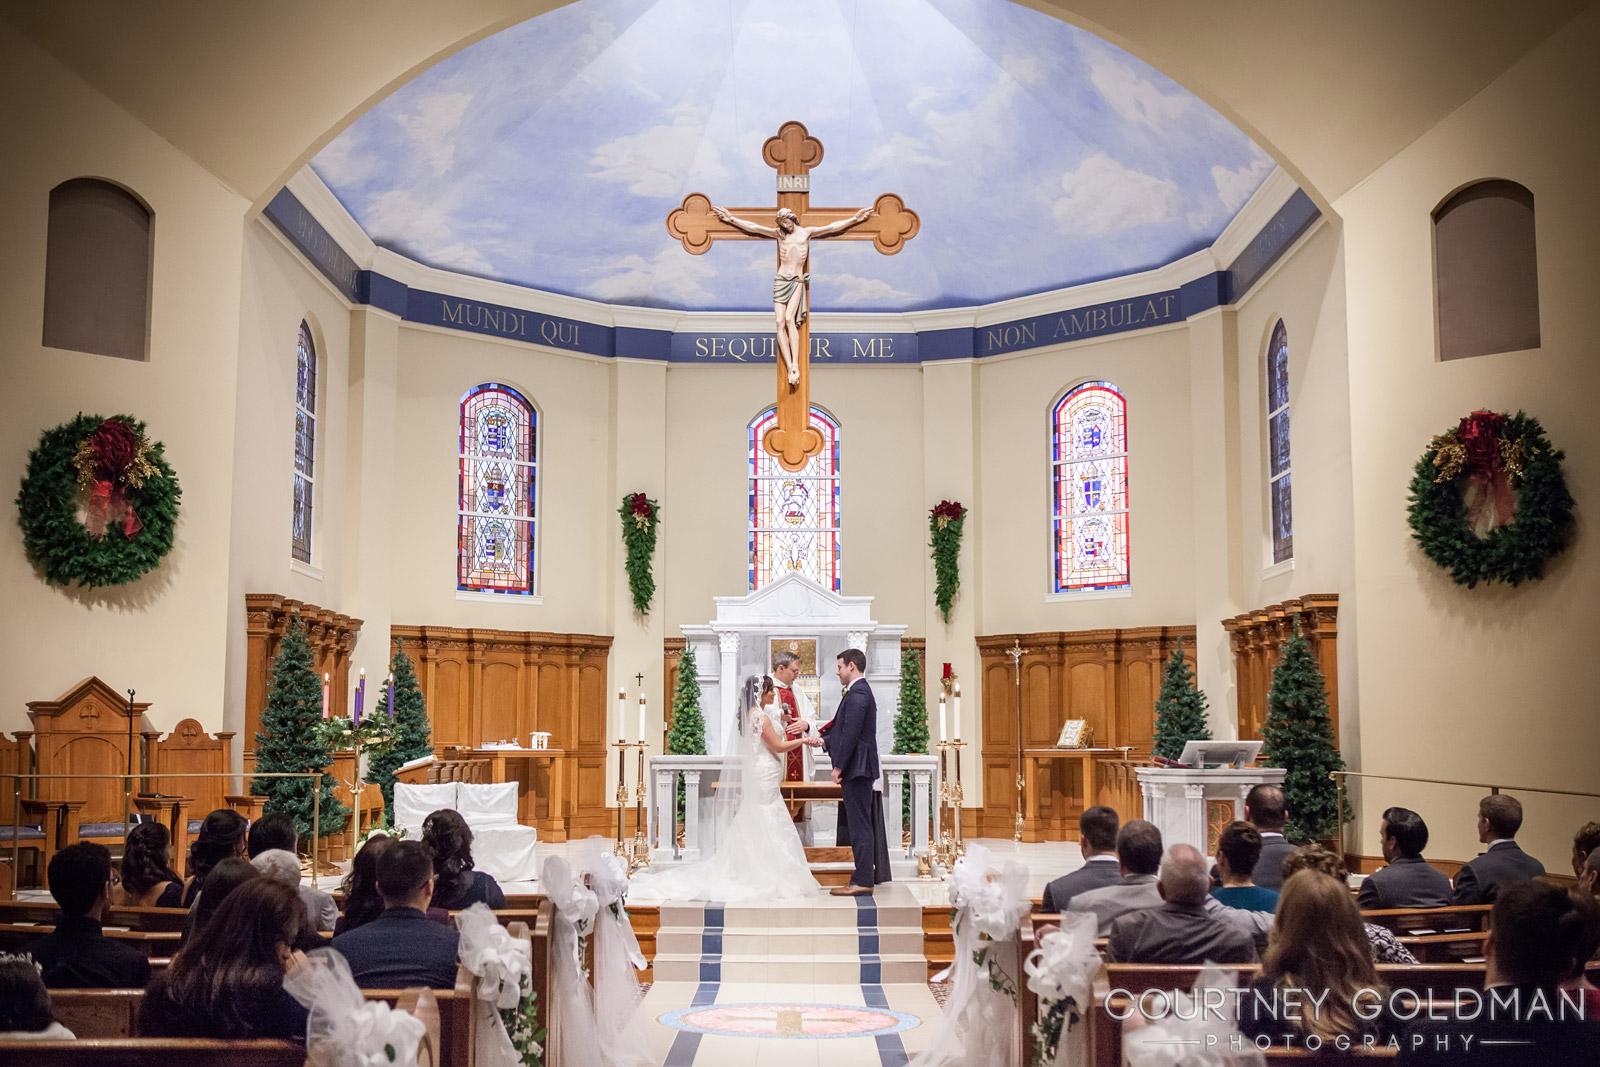 Atlanta-Wedding-Photography-by-Courtney-Goldman-69.jpg